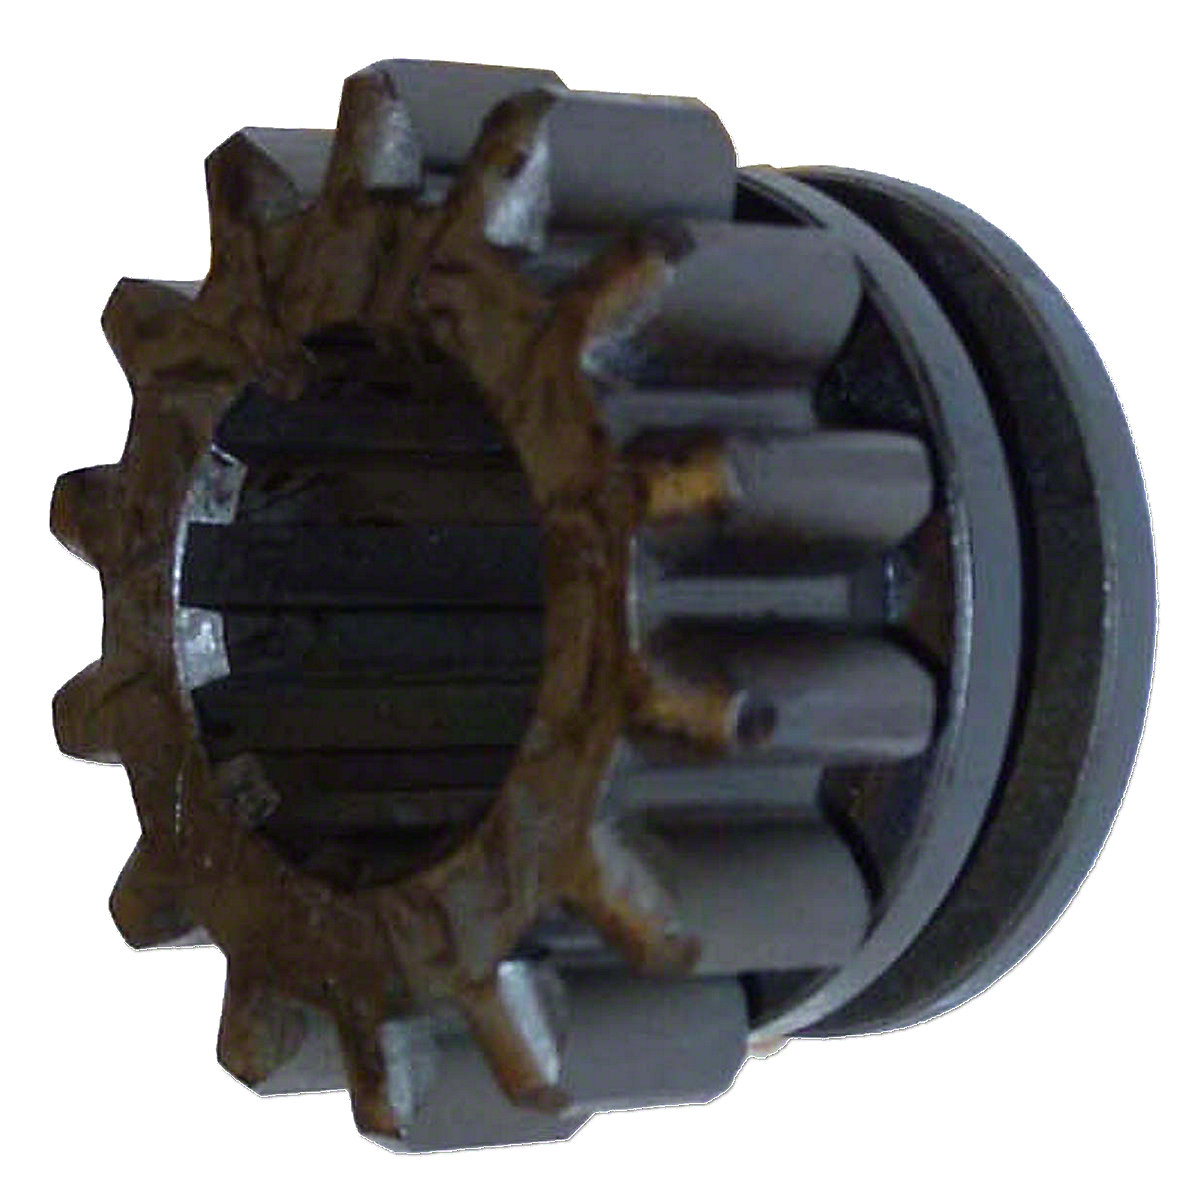 Pto Drive Gear : Cks pto drive gear